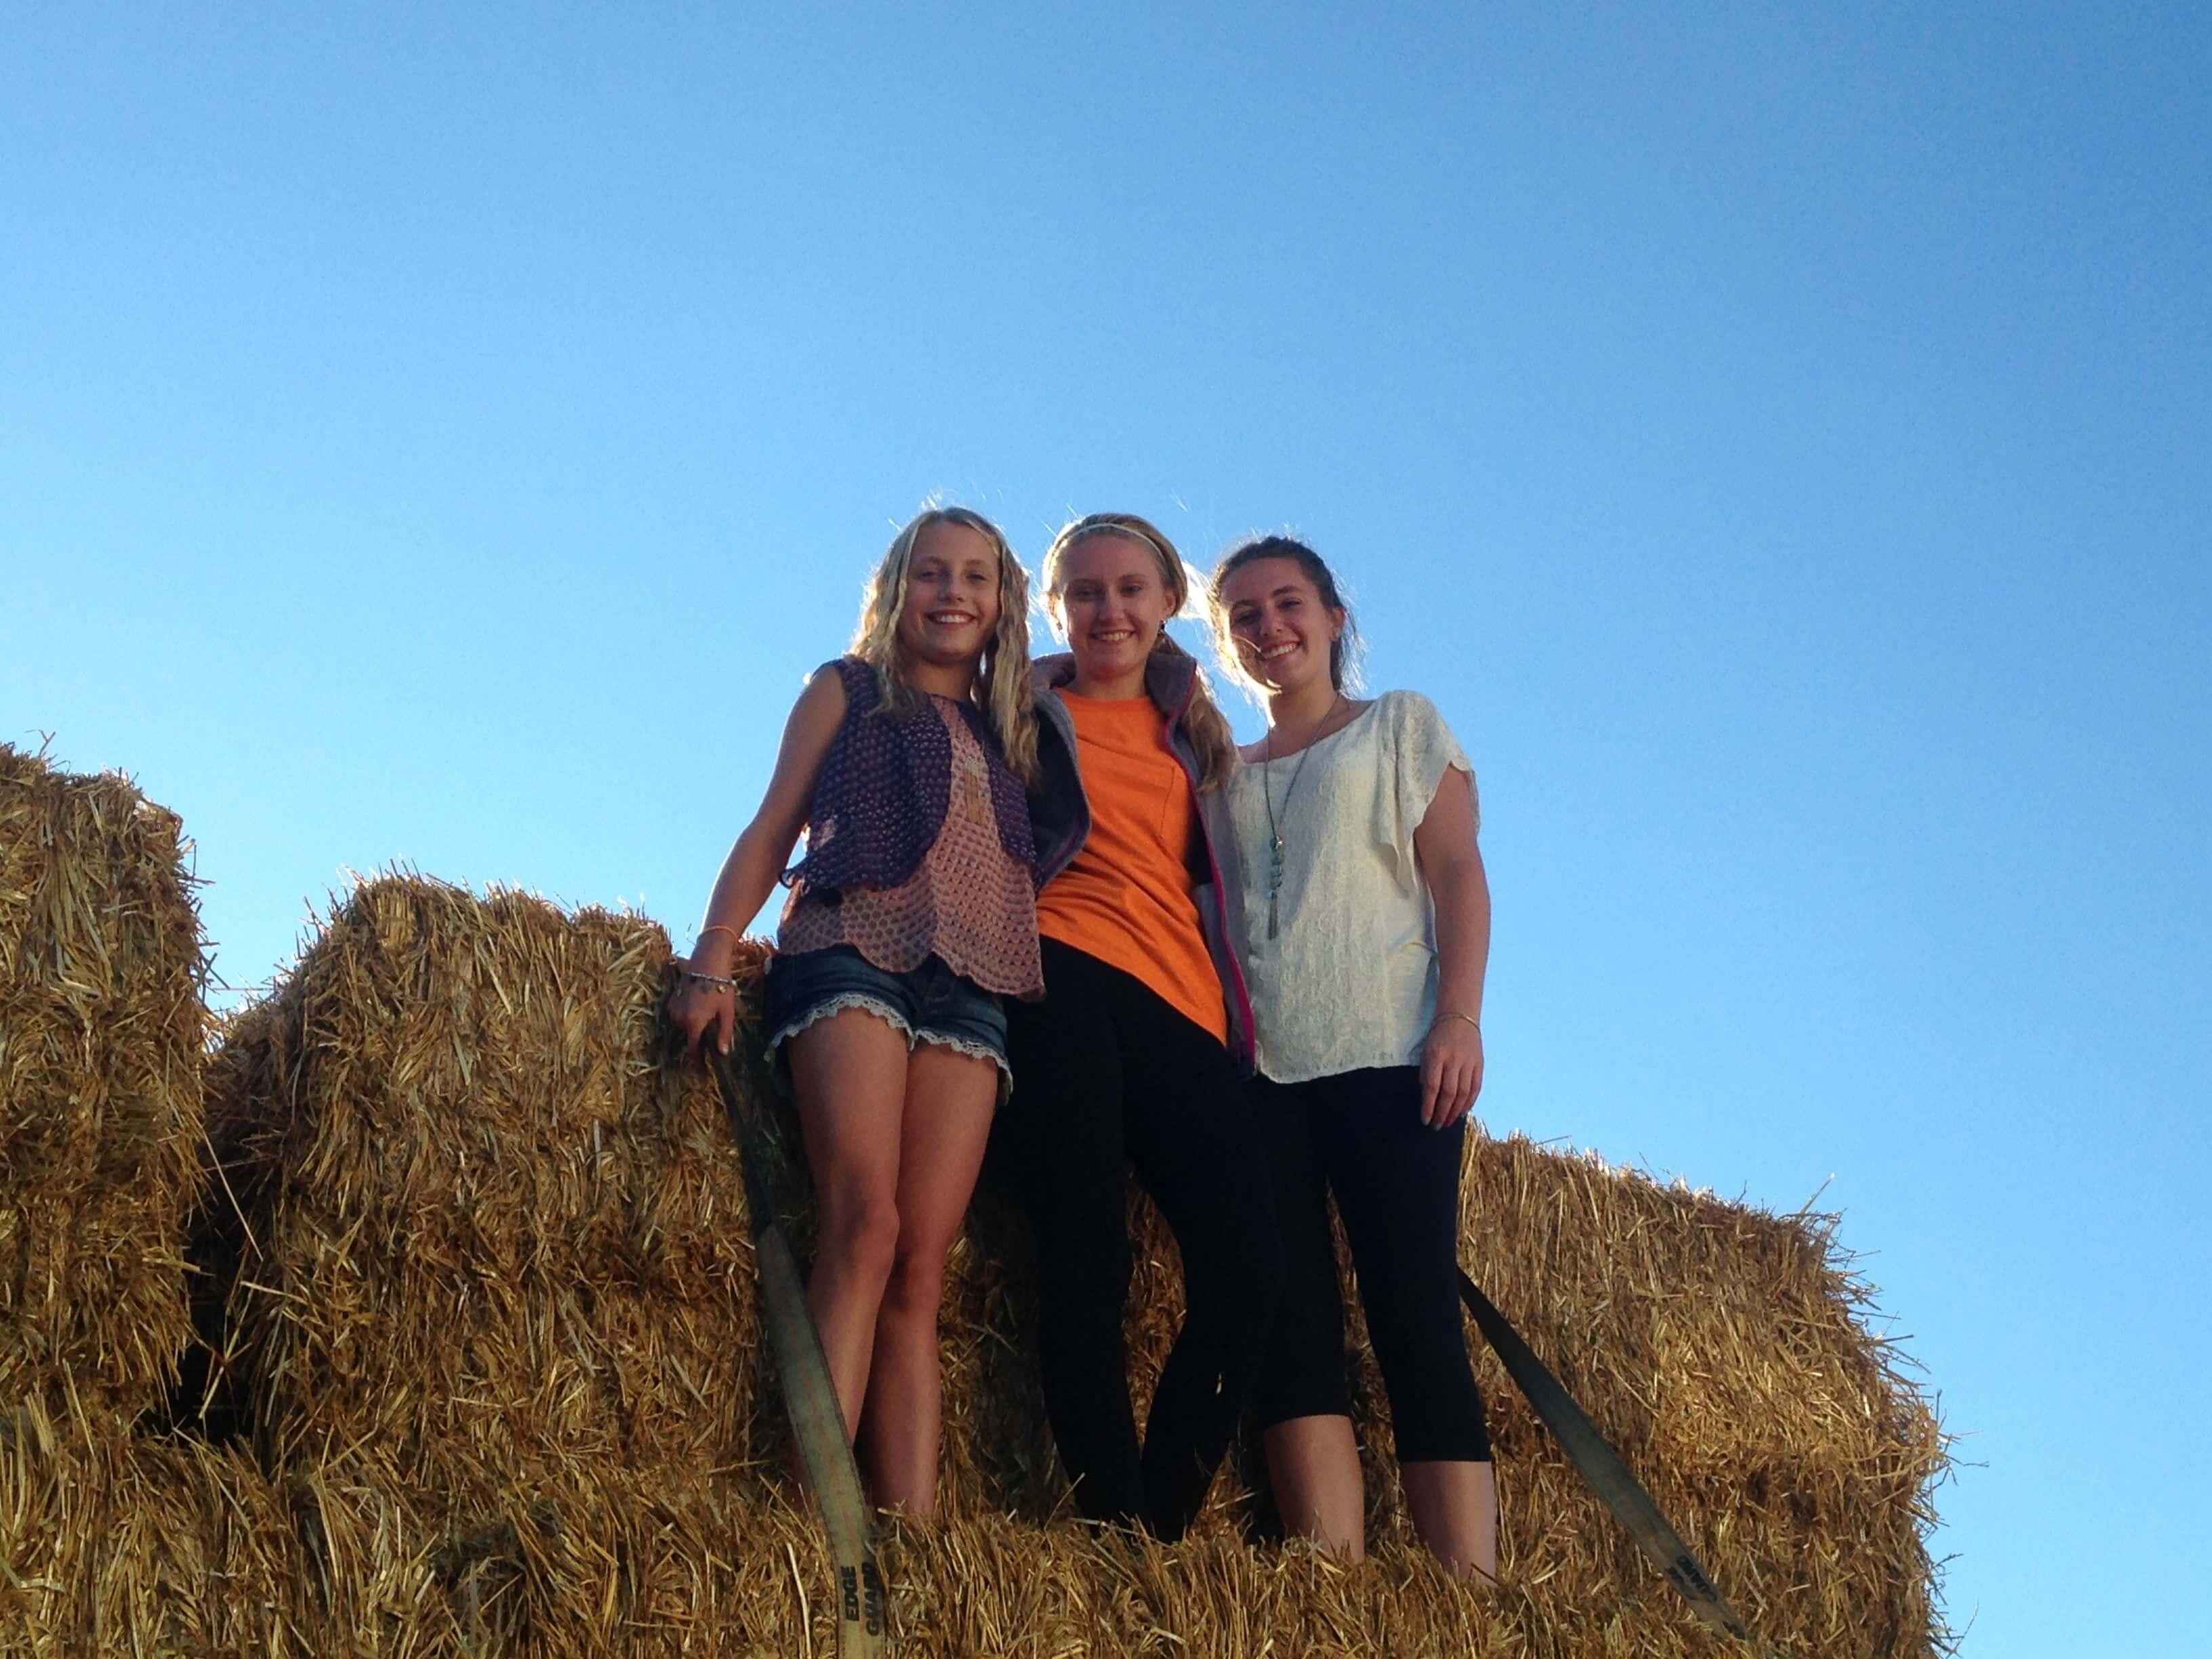 Leah's three daughters